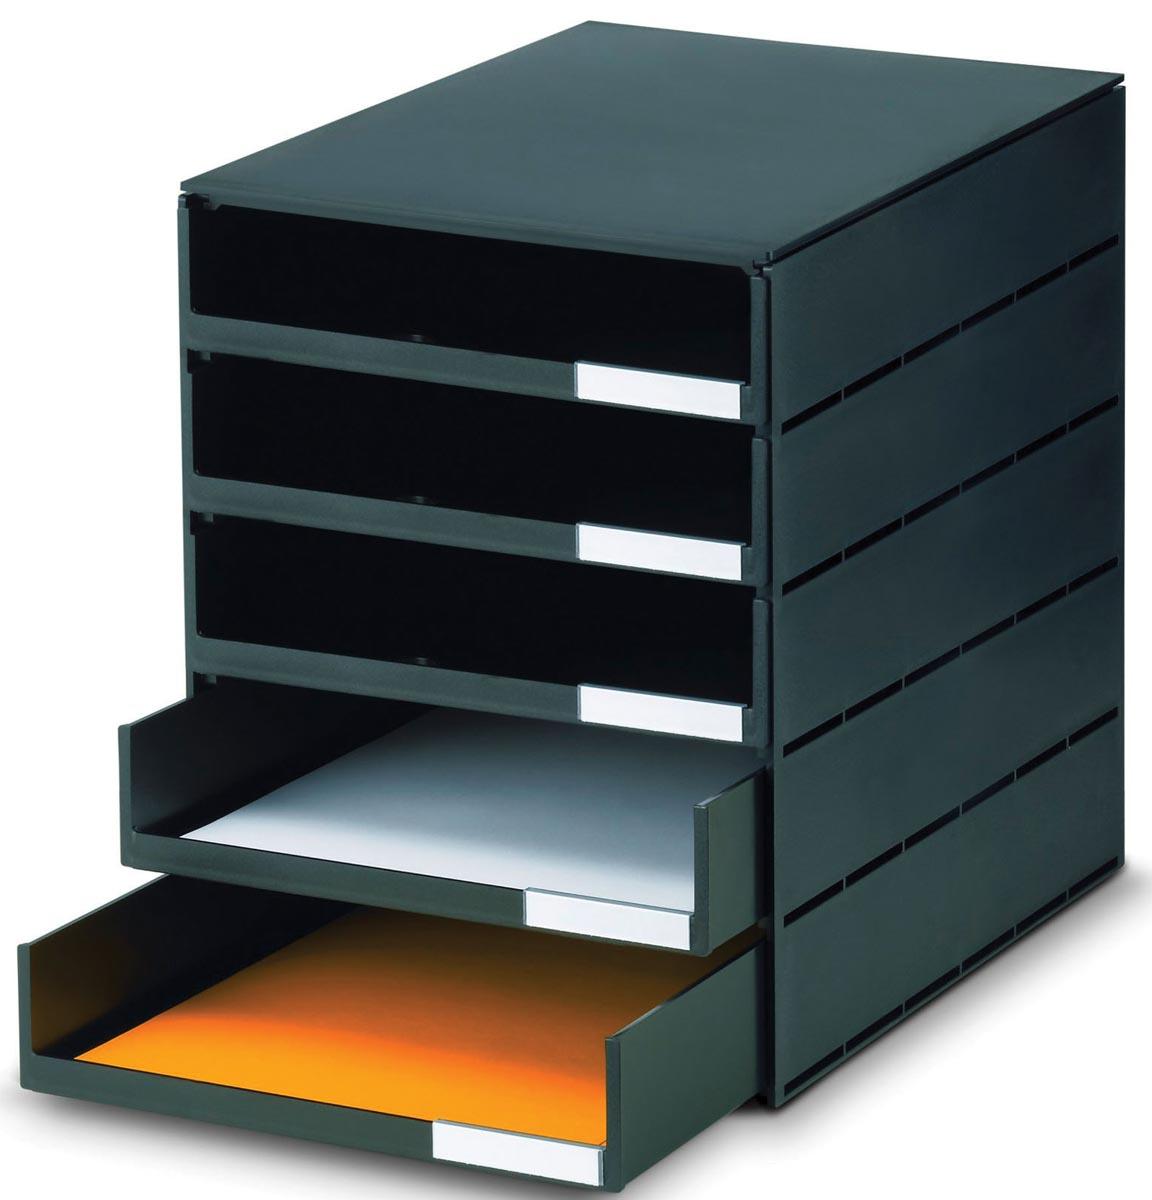 Styro ladenblok Styroval met 5 open laden, zwart